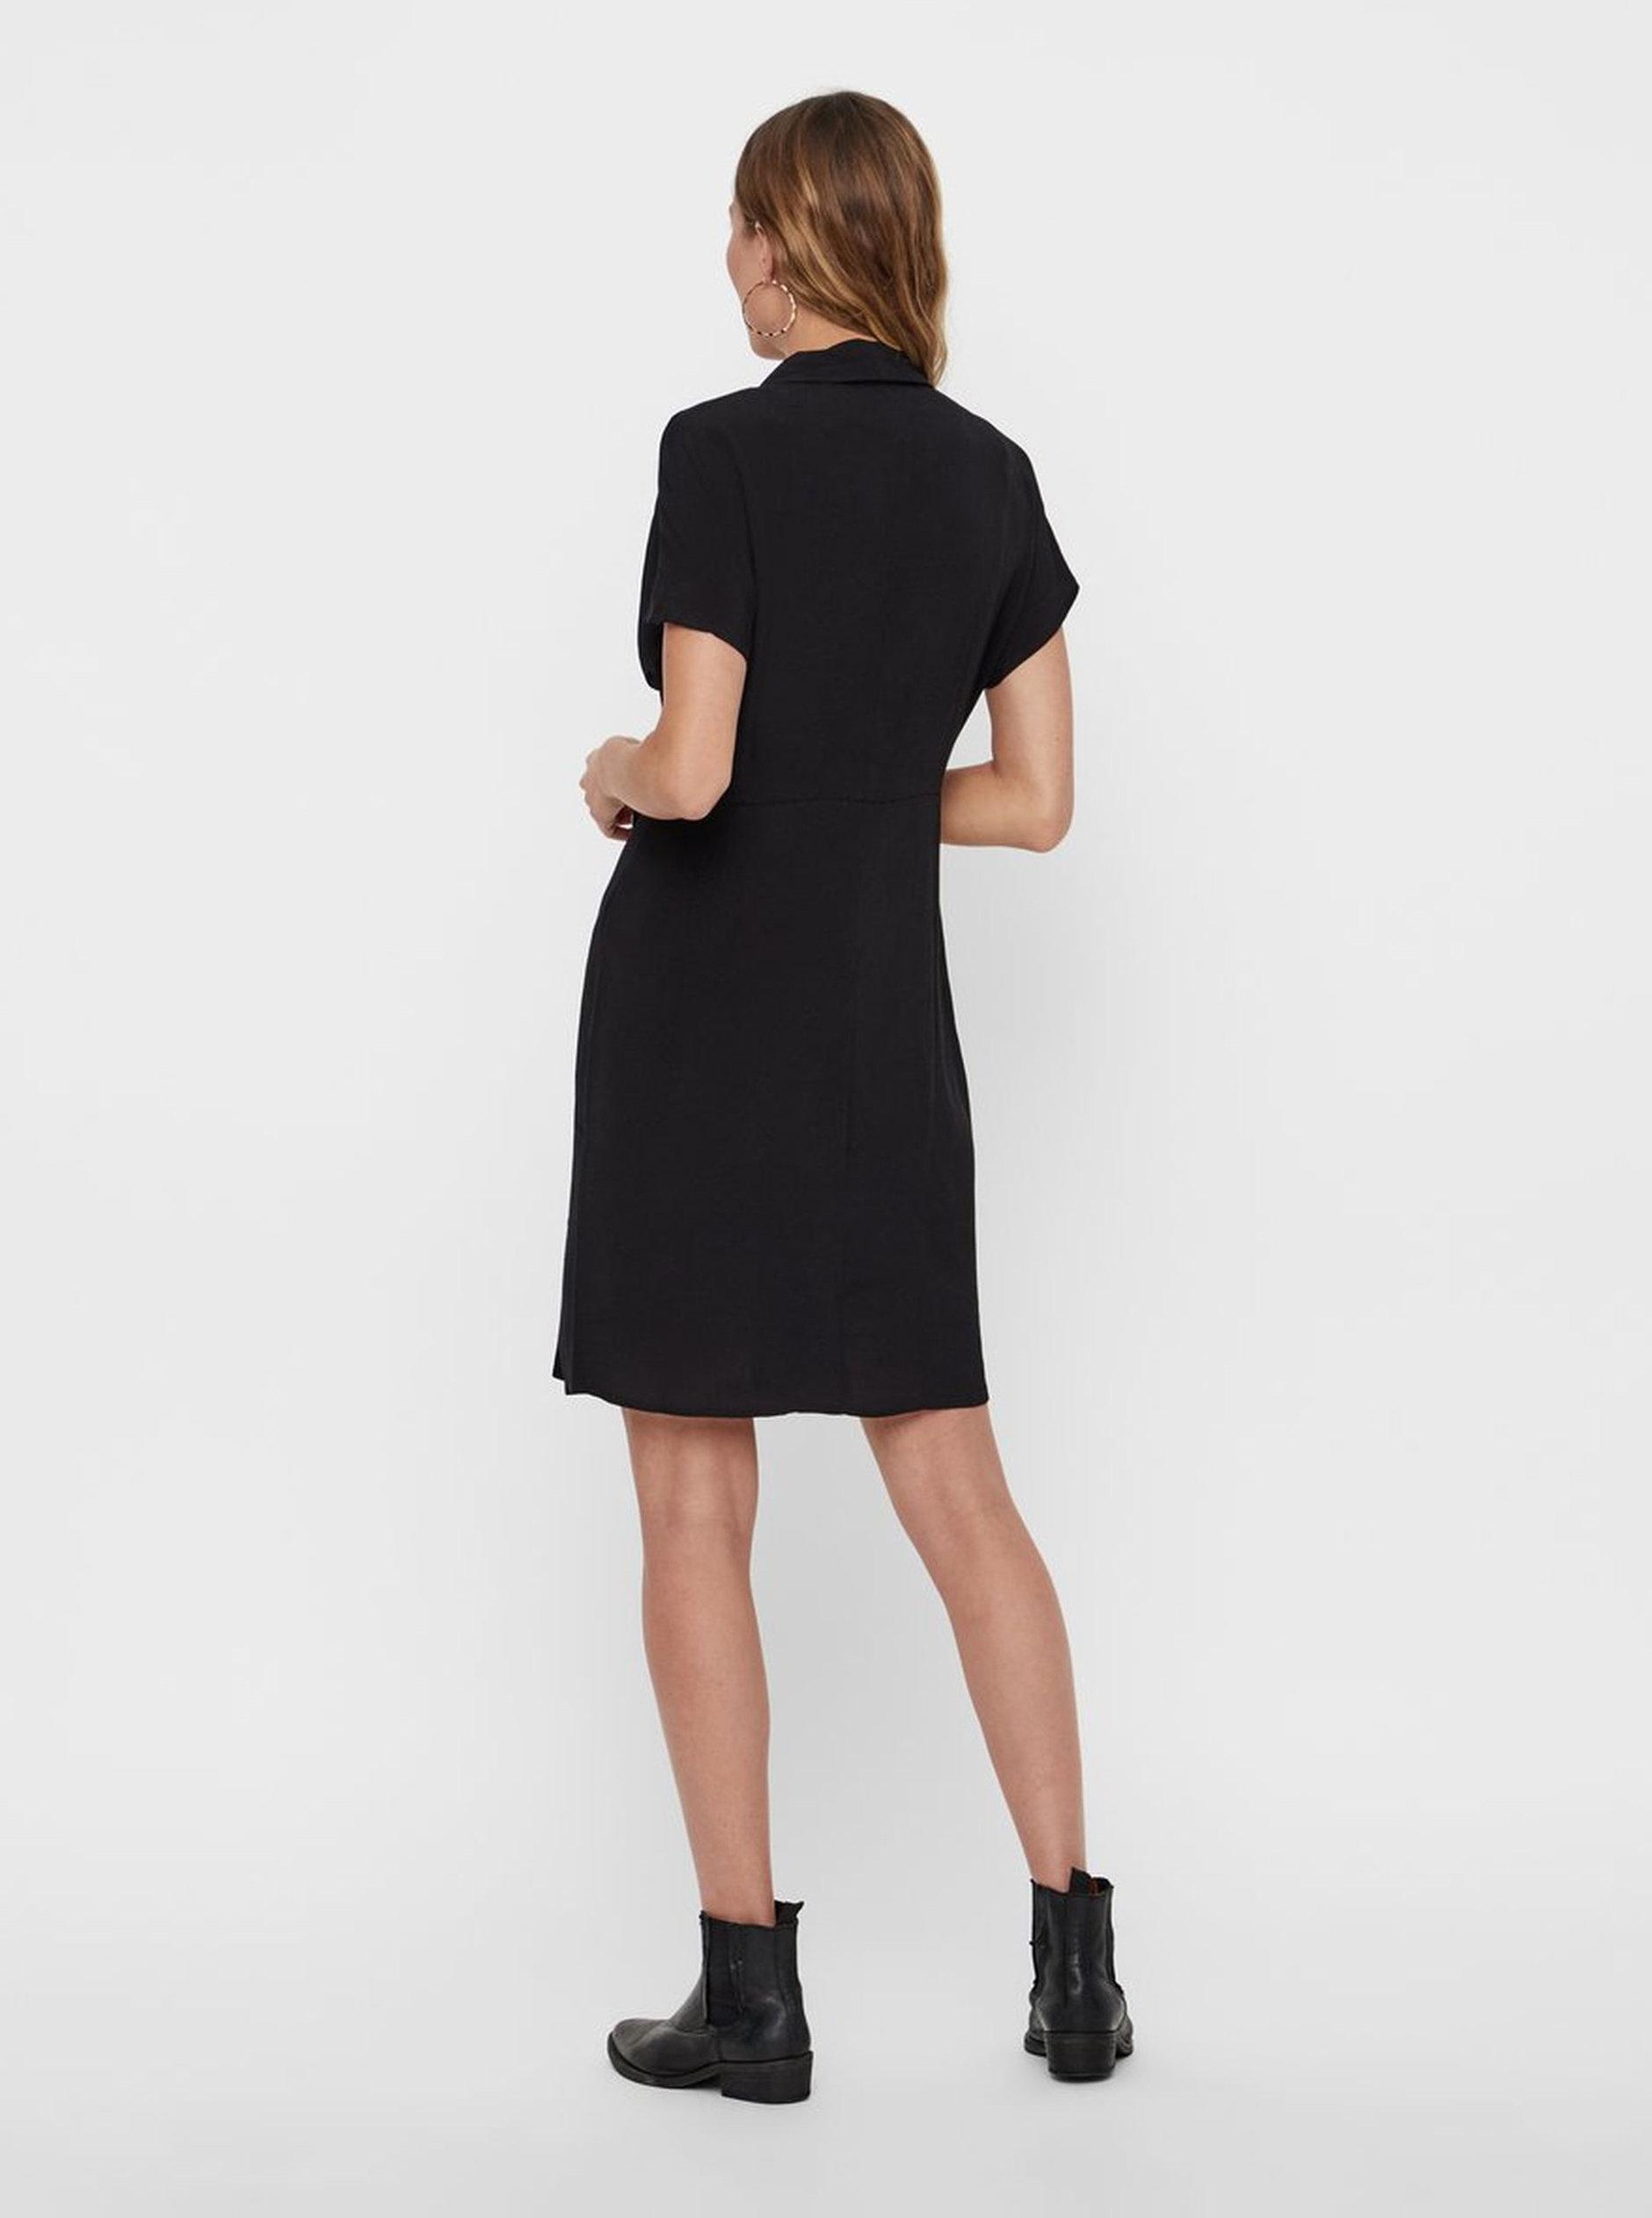 Černé šaty VERO MODA Riga ... 7f4ba2d511